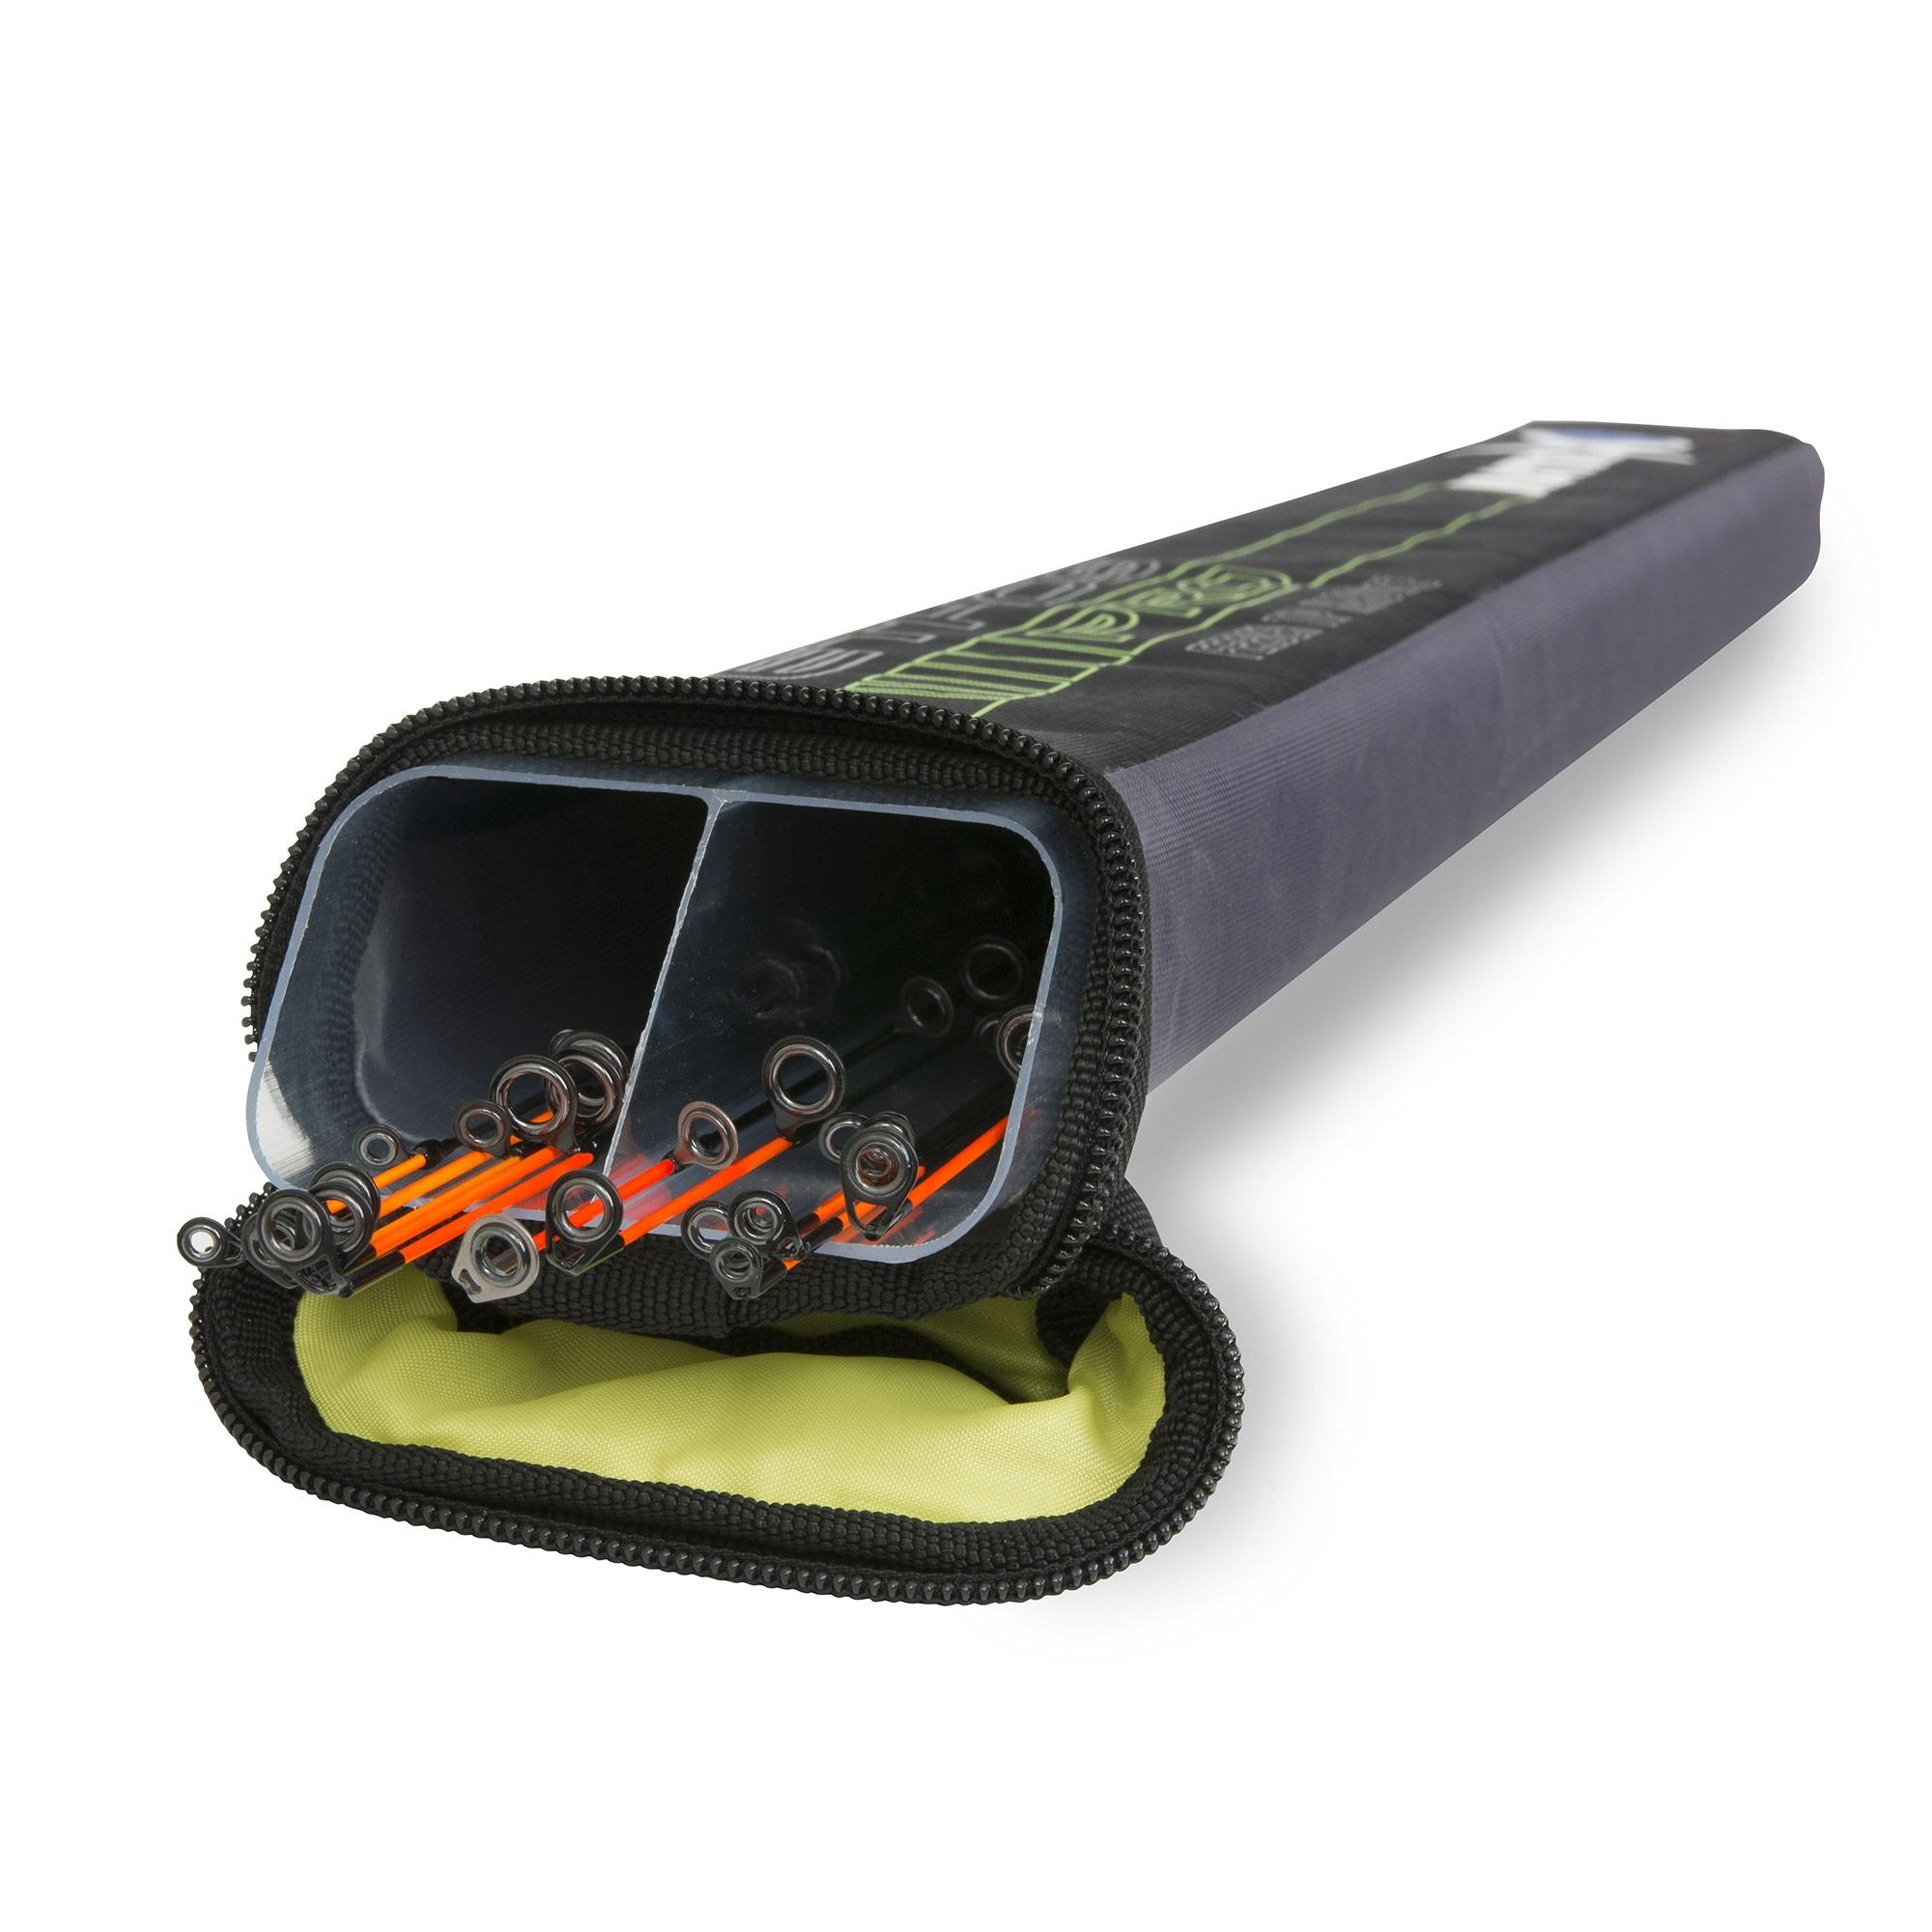 Fodero Rigido Porta cimini NEW Ethos Pro MATRIX h 82 cm